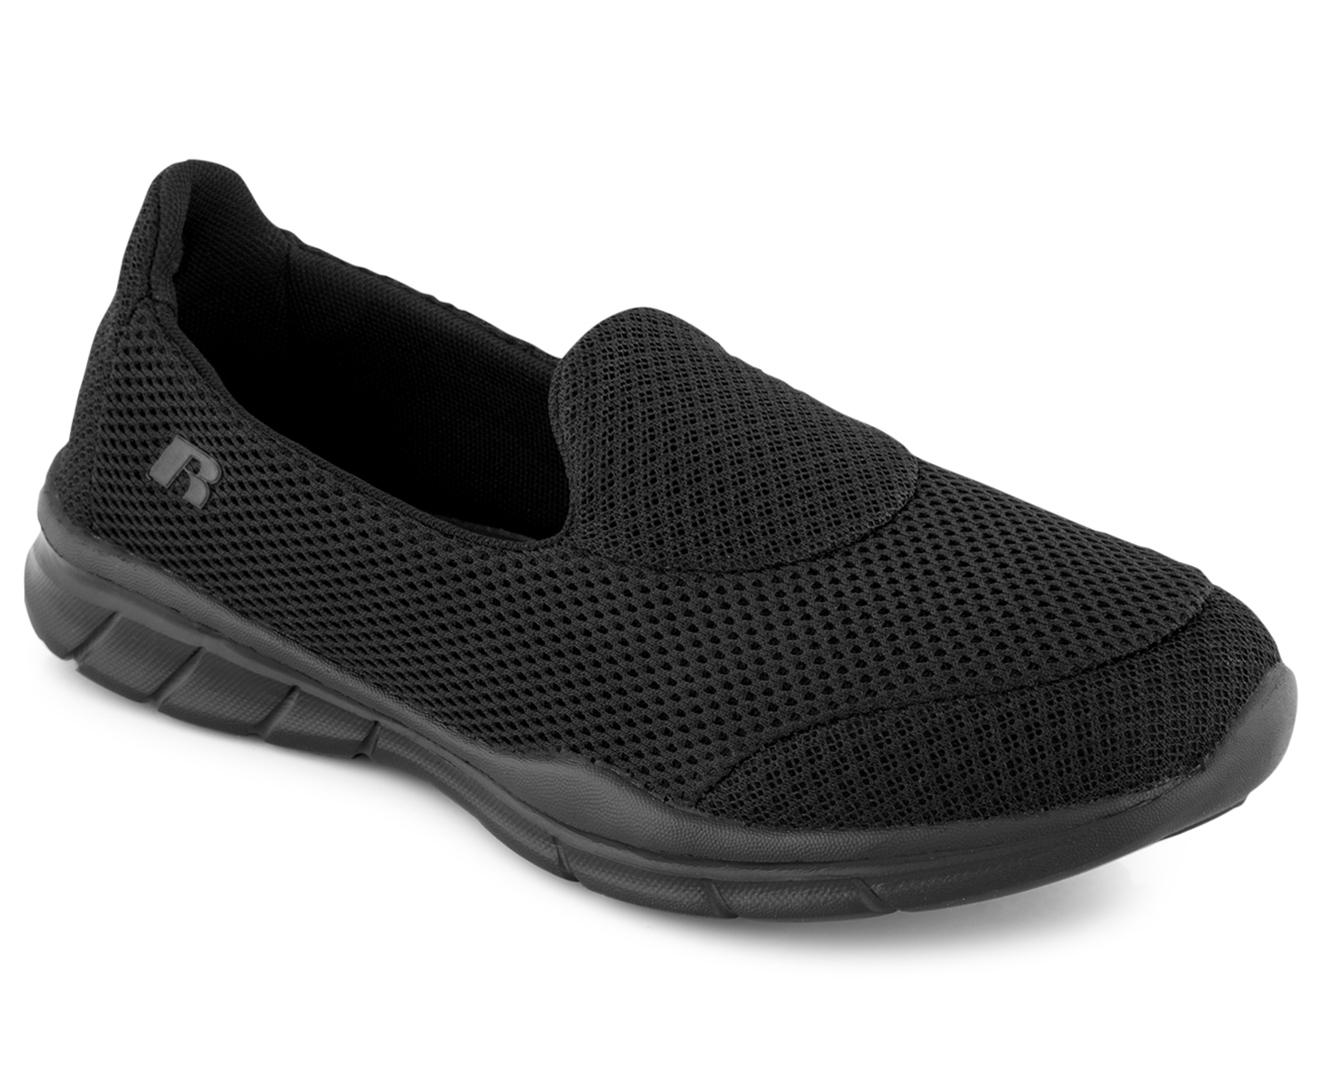 Russell Athletic Womenu0026#39;s Desiree Slip-On Shoe - Black | EBay